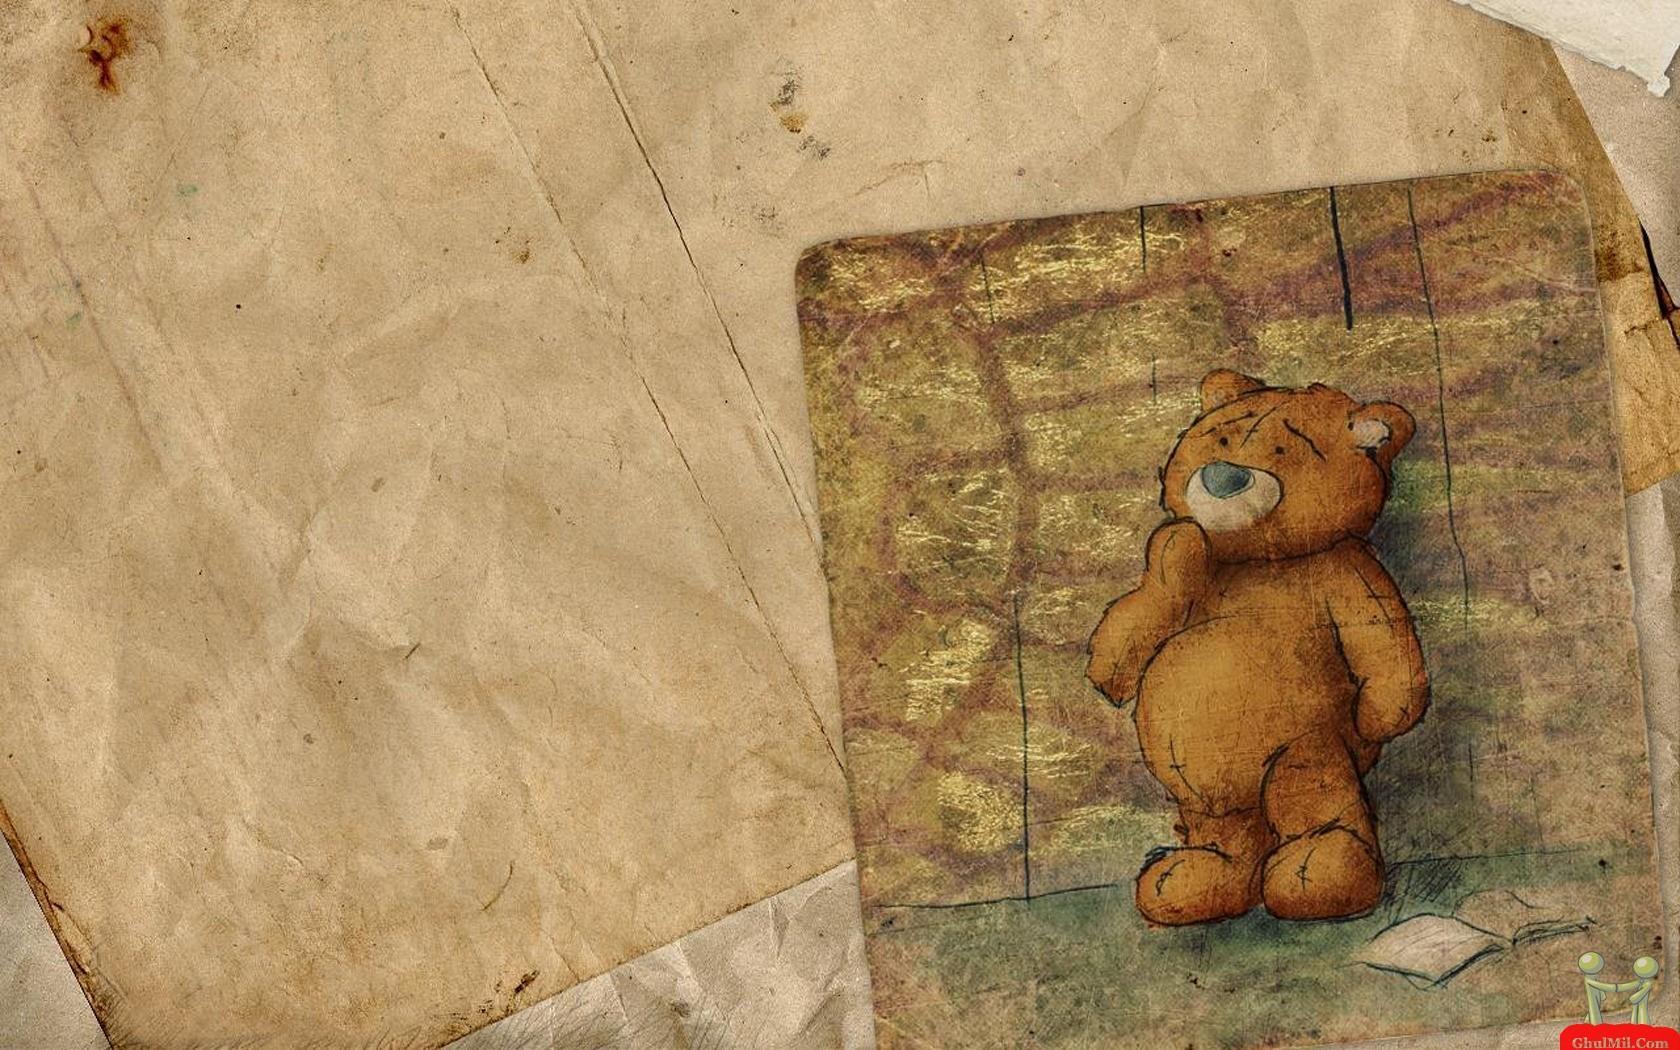 Cute Teddy Bear Hd Wallpaper Download Teddy Bear Wallpaper Android 11143 Wallpaper Walldiskpaper